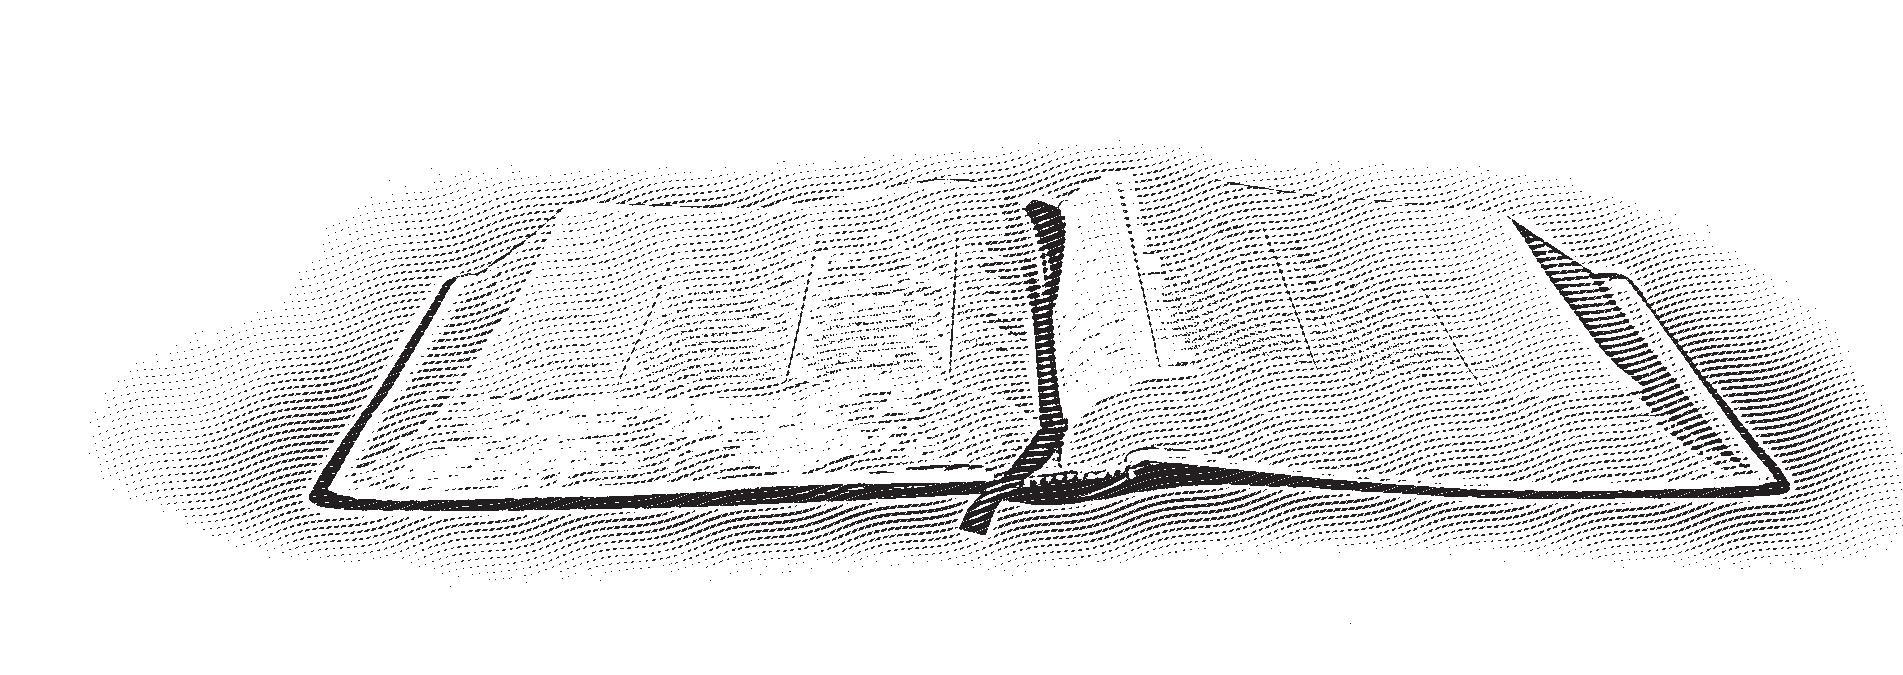 Page 8 of Bibelen er unik